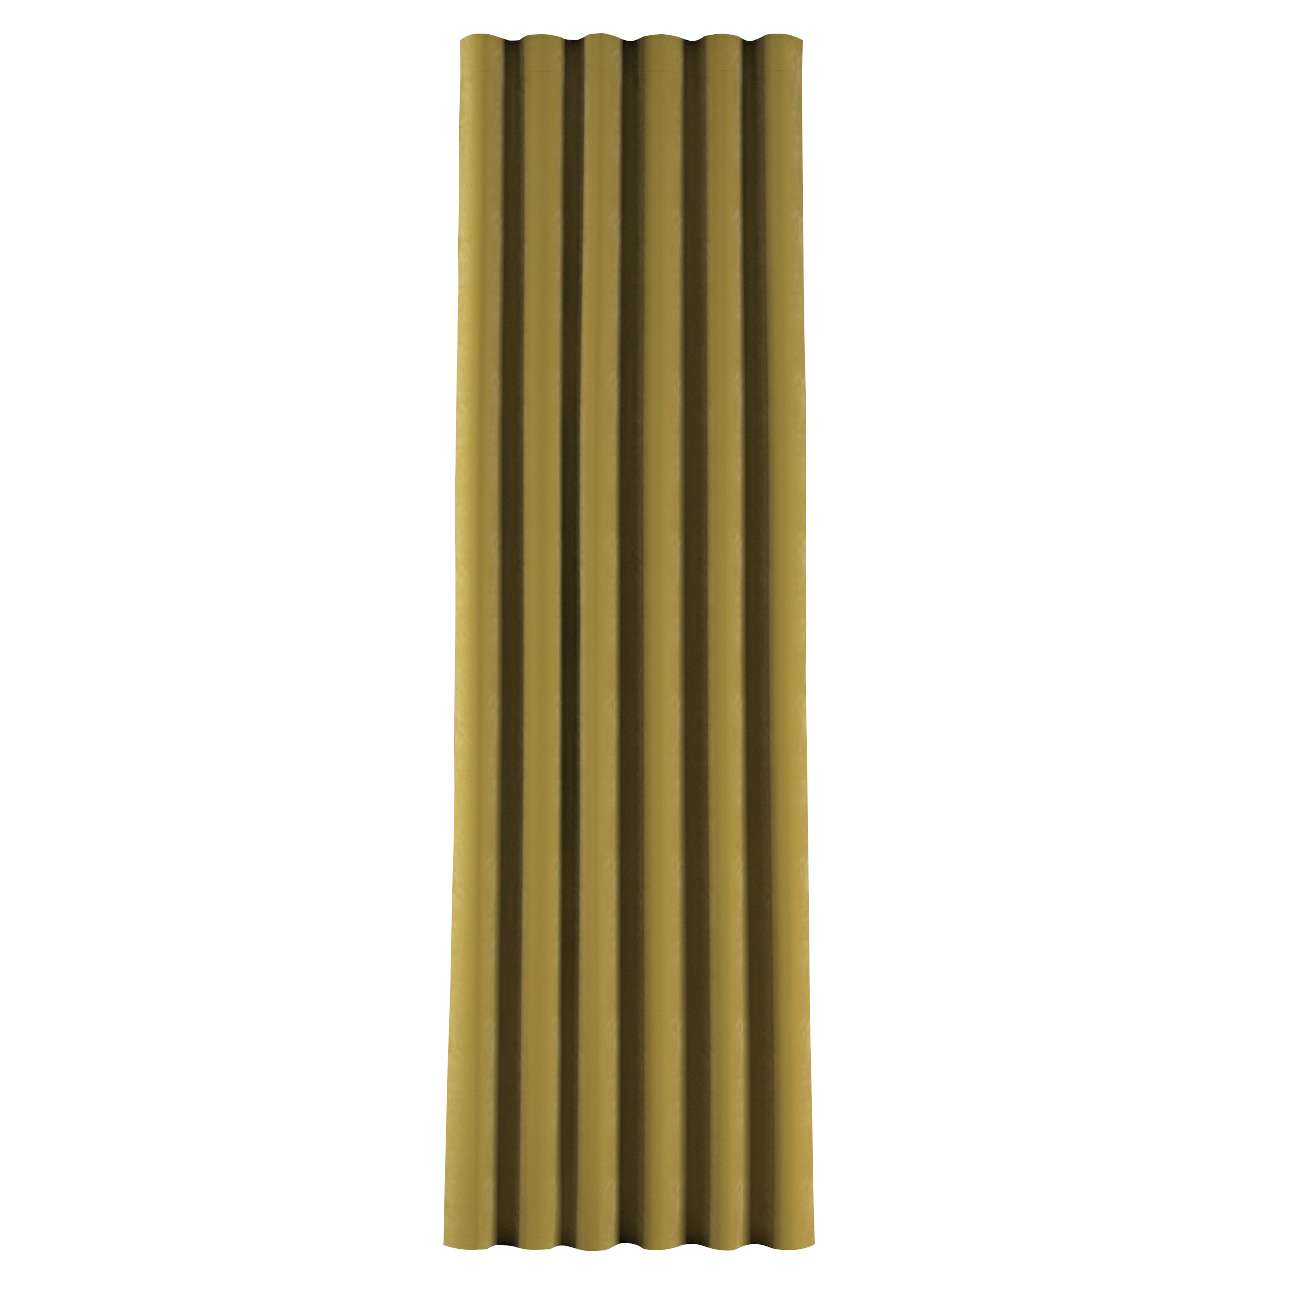 Zaves s riasením WAVE V kolekcii Velvet, tkanina: 704-27